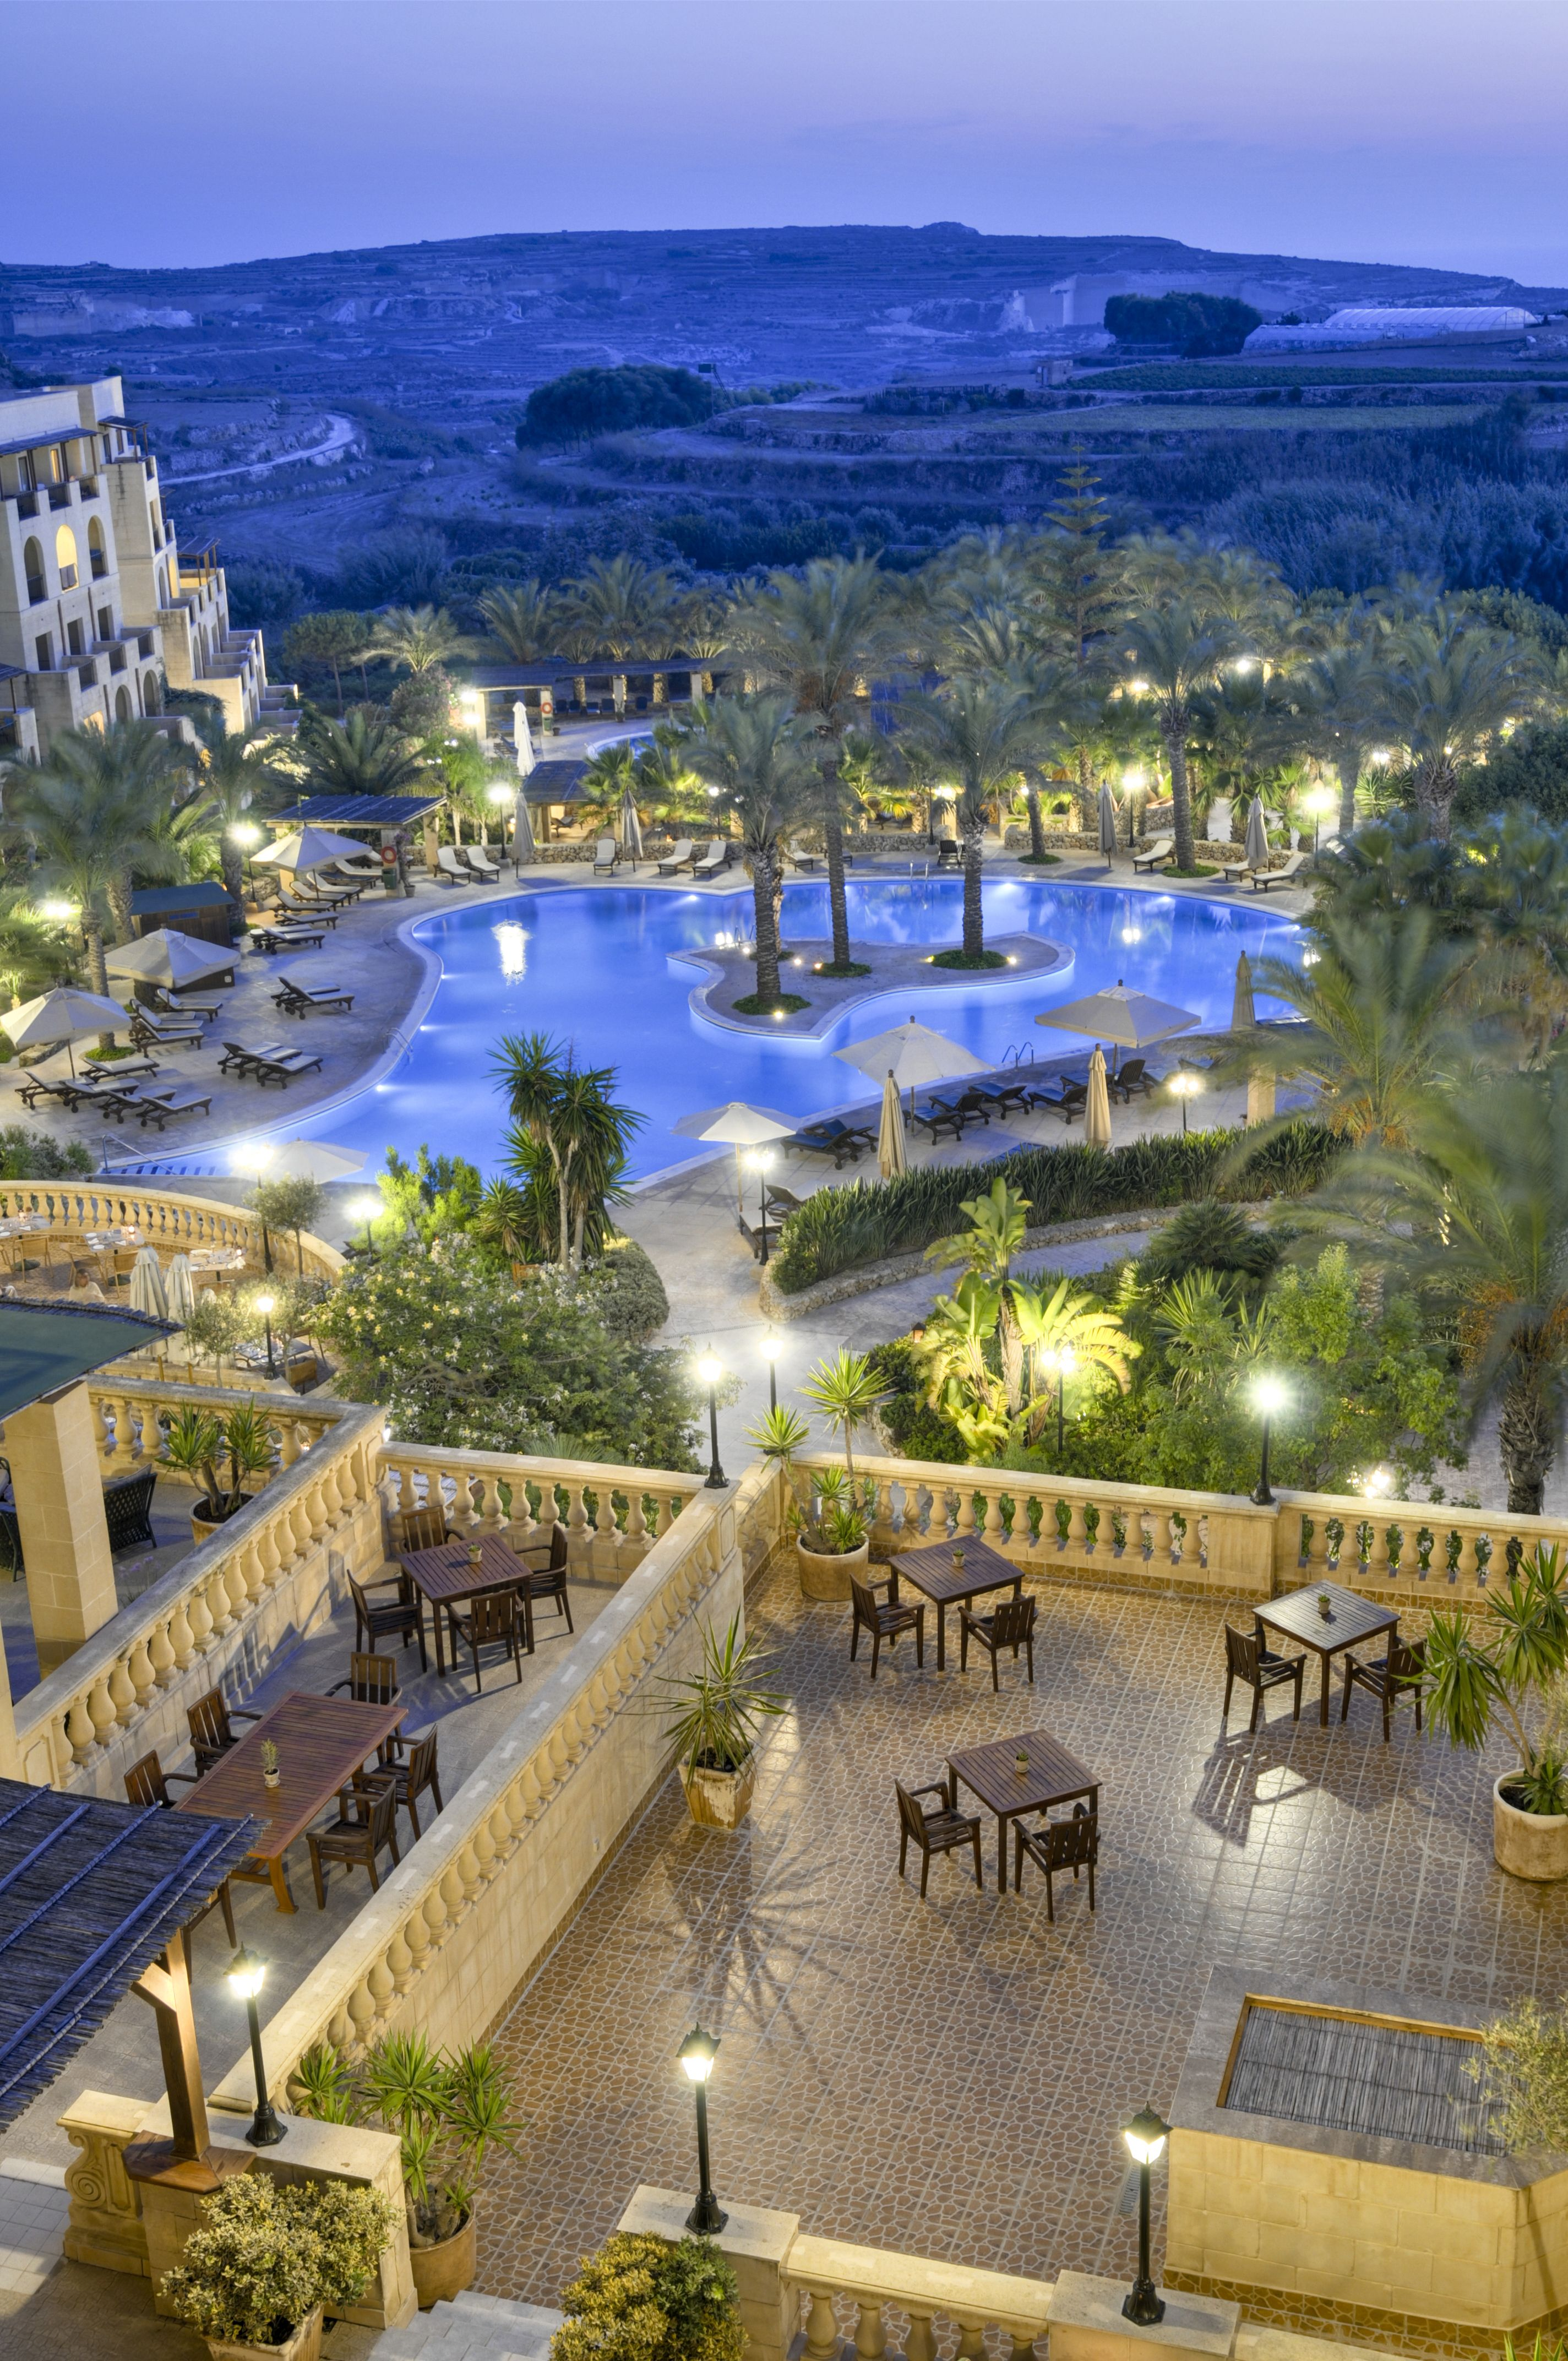 Exterior views of the kempinski hotel san lawrenz gozo malta so beautiful